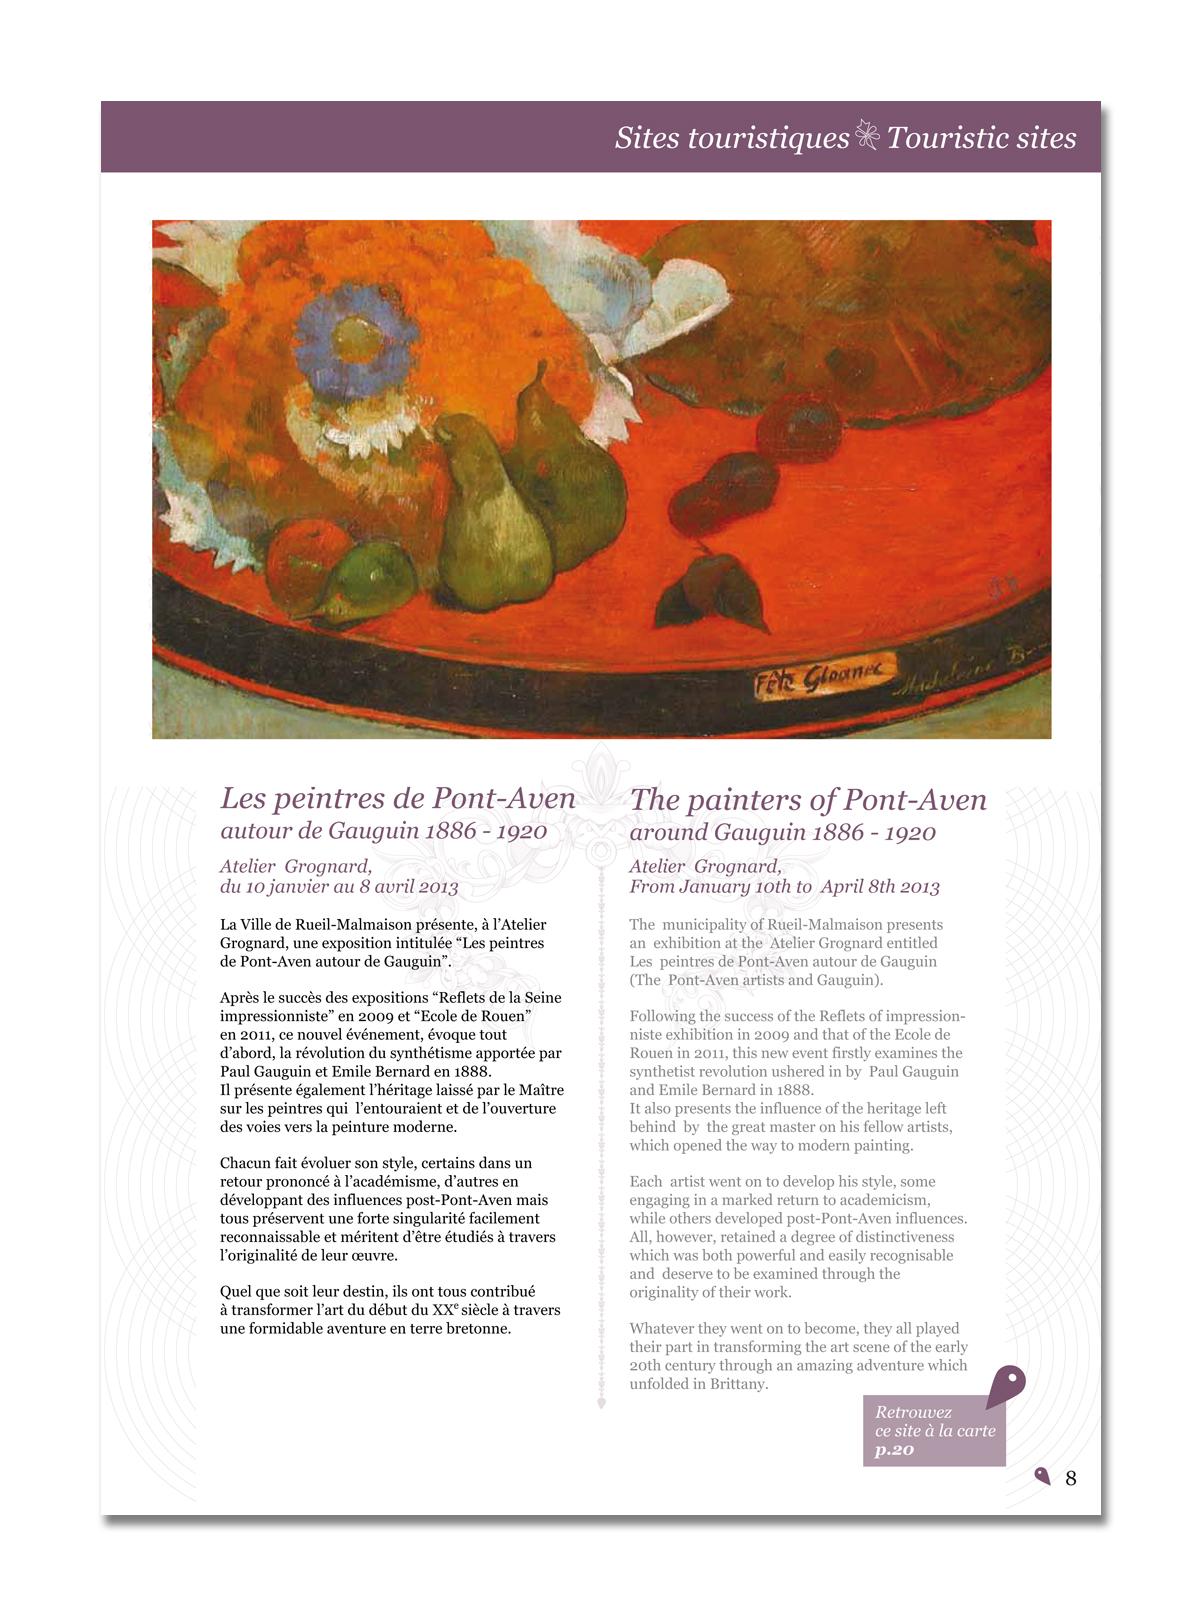 Brochure Rueil-Malamison